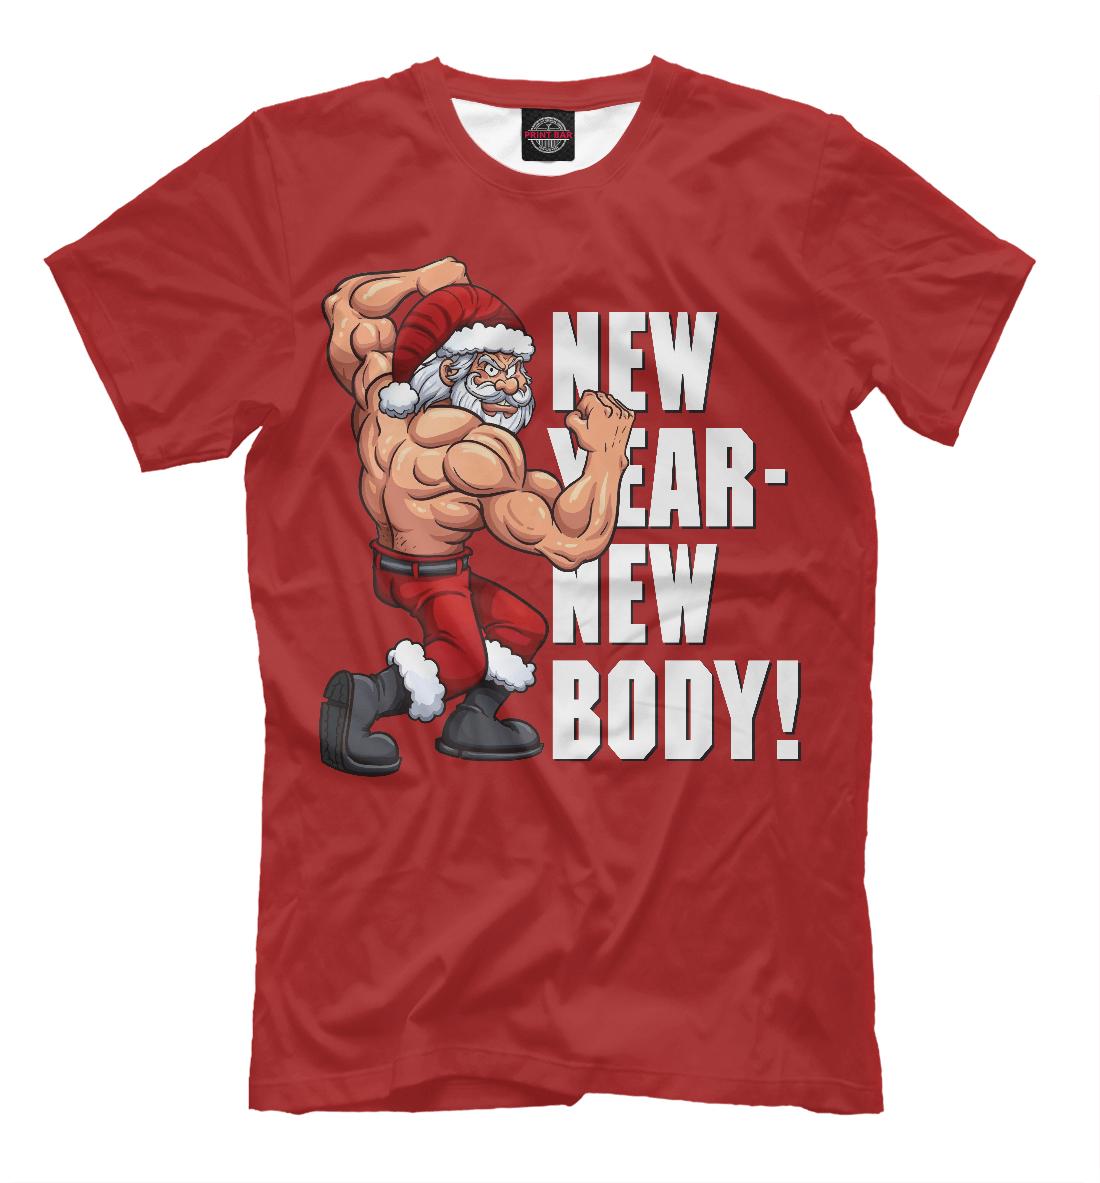 New Year - New Body! new year new body